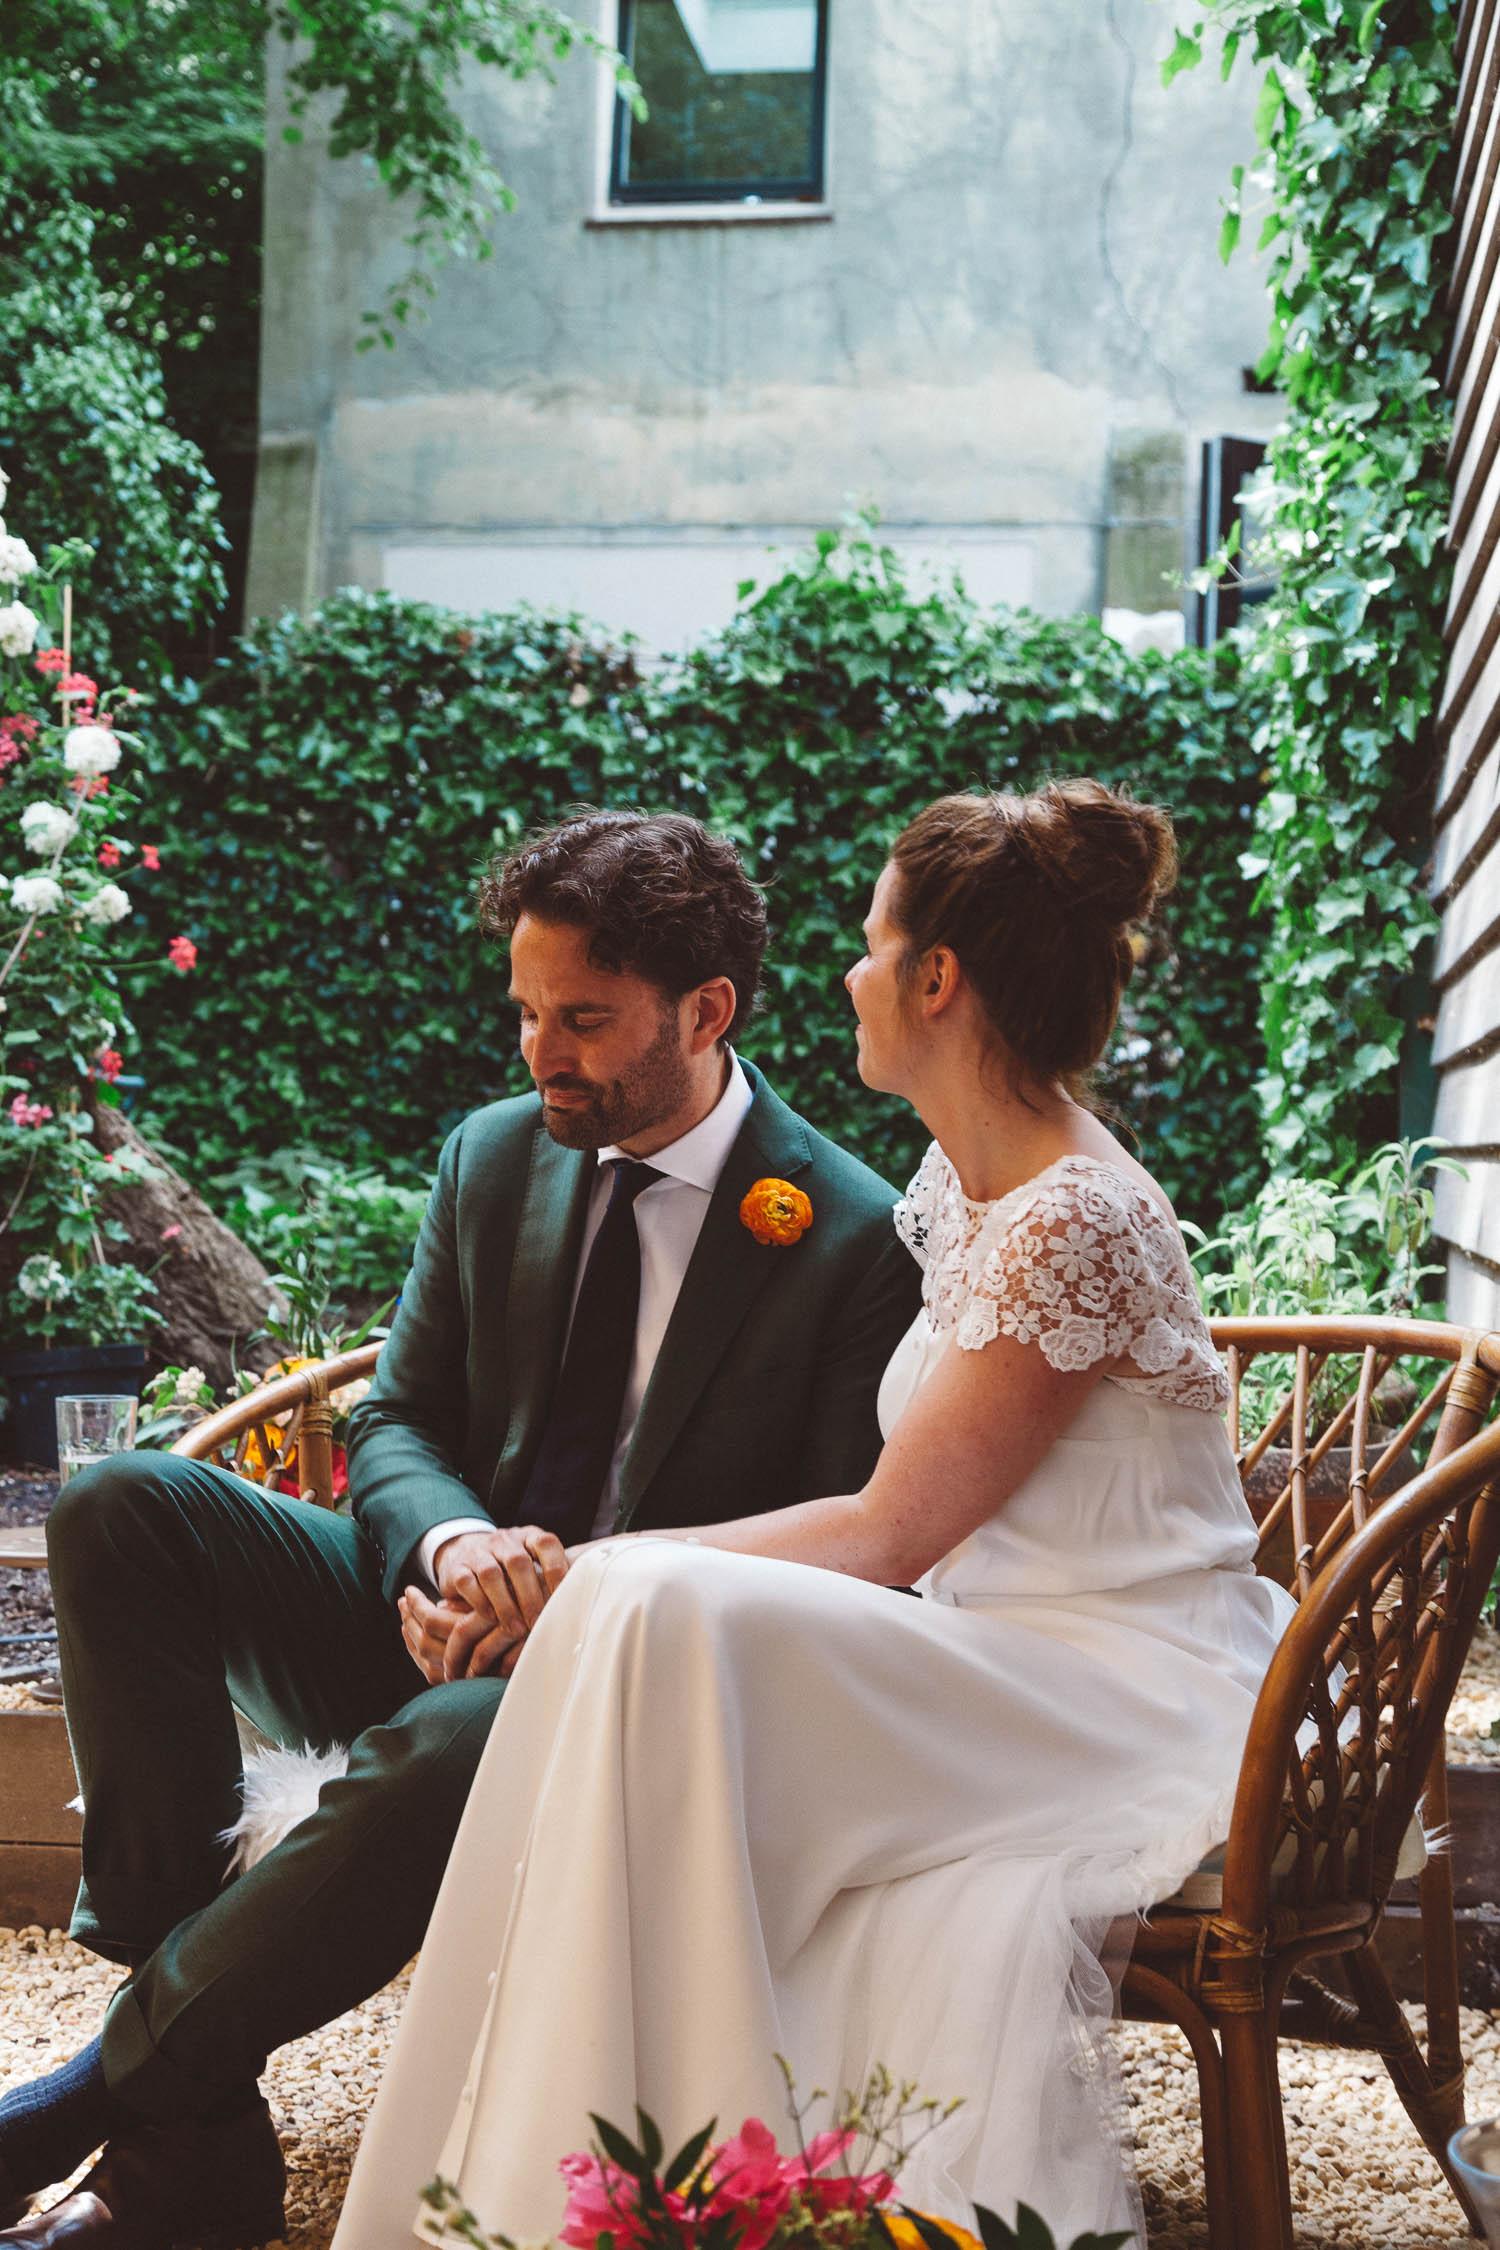 Backyard-wedding-Bruiloft-Annemiek-David-fotografie-photography-On-a-hazy-morning-Amsterdam-The-Netherlands160.jpg